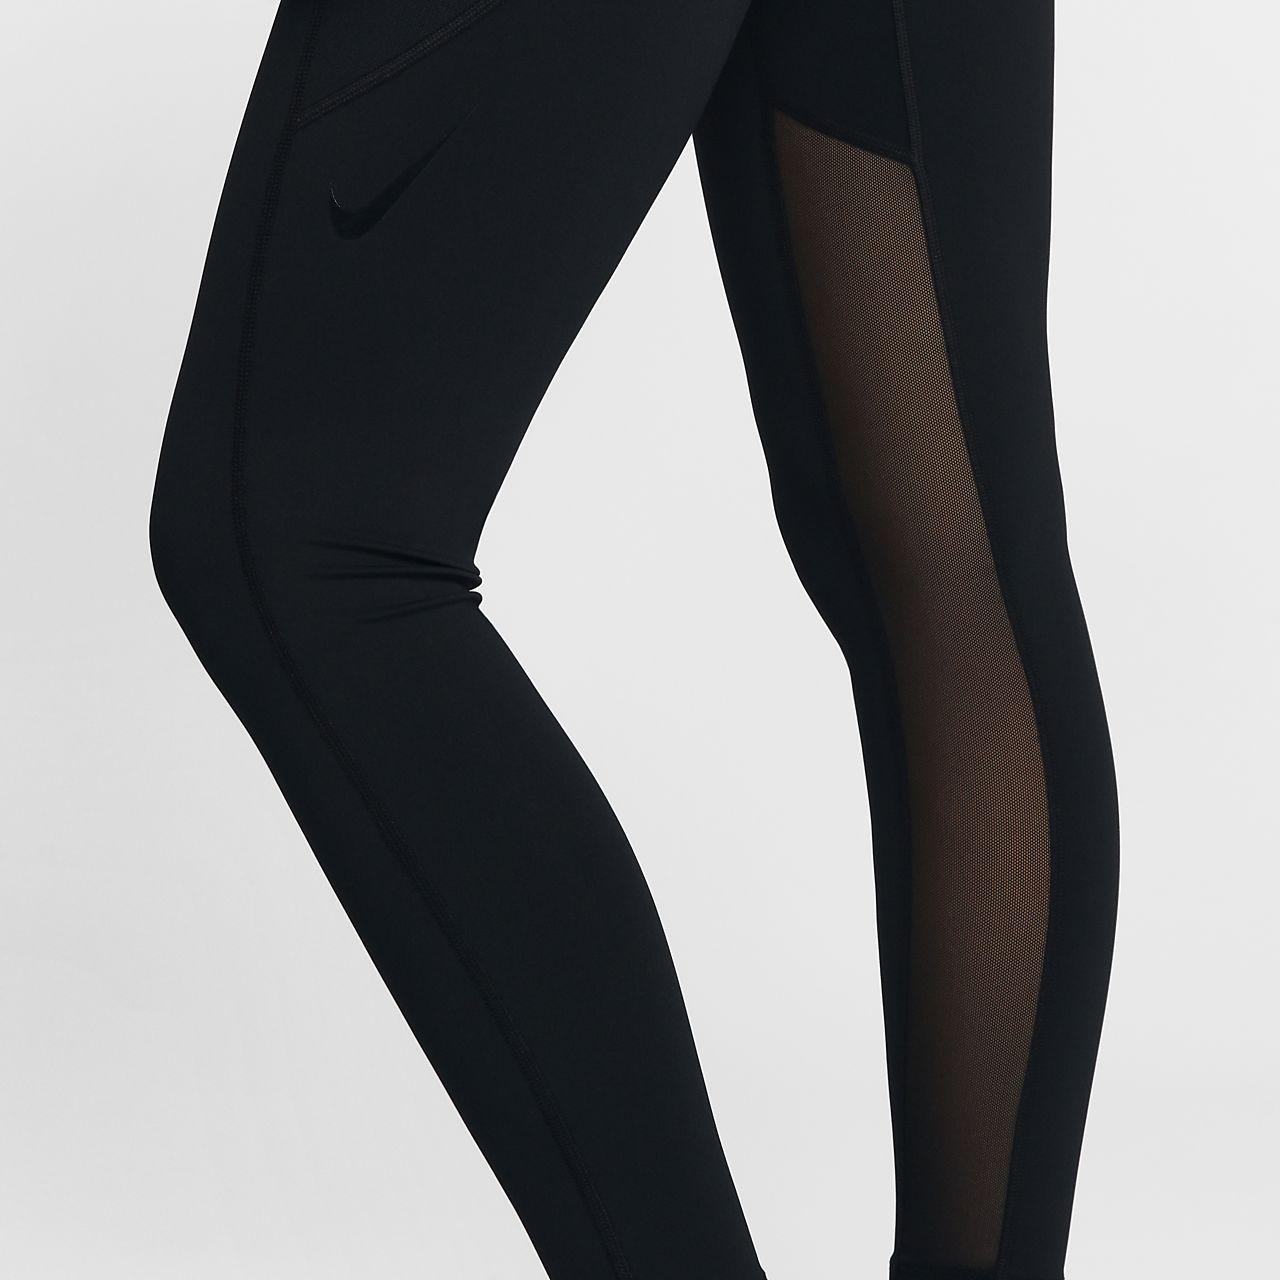 92f32415fc9c4 Nike Power Pocket Lux Women's High-Waist Training Tights. Nike.com ZA